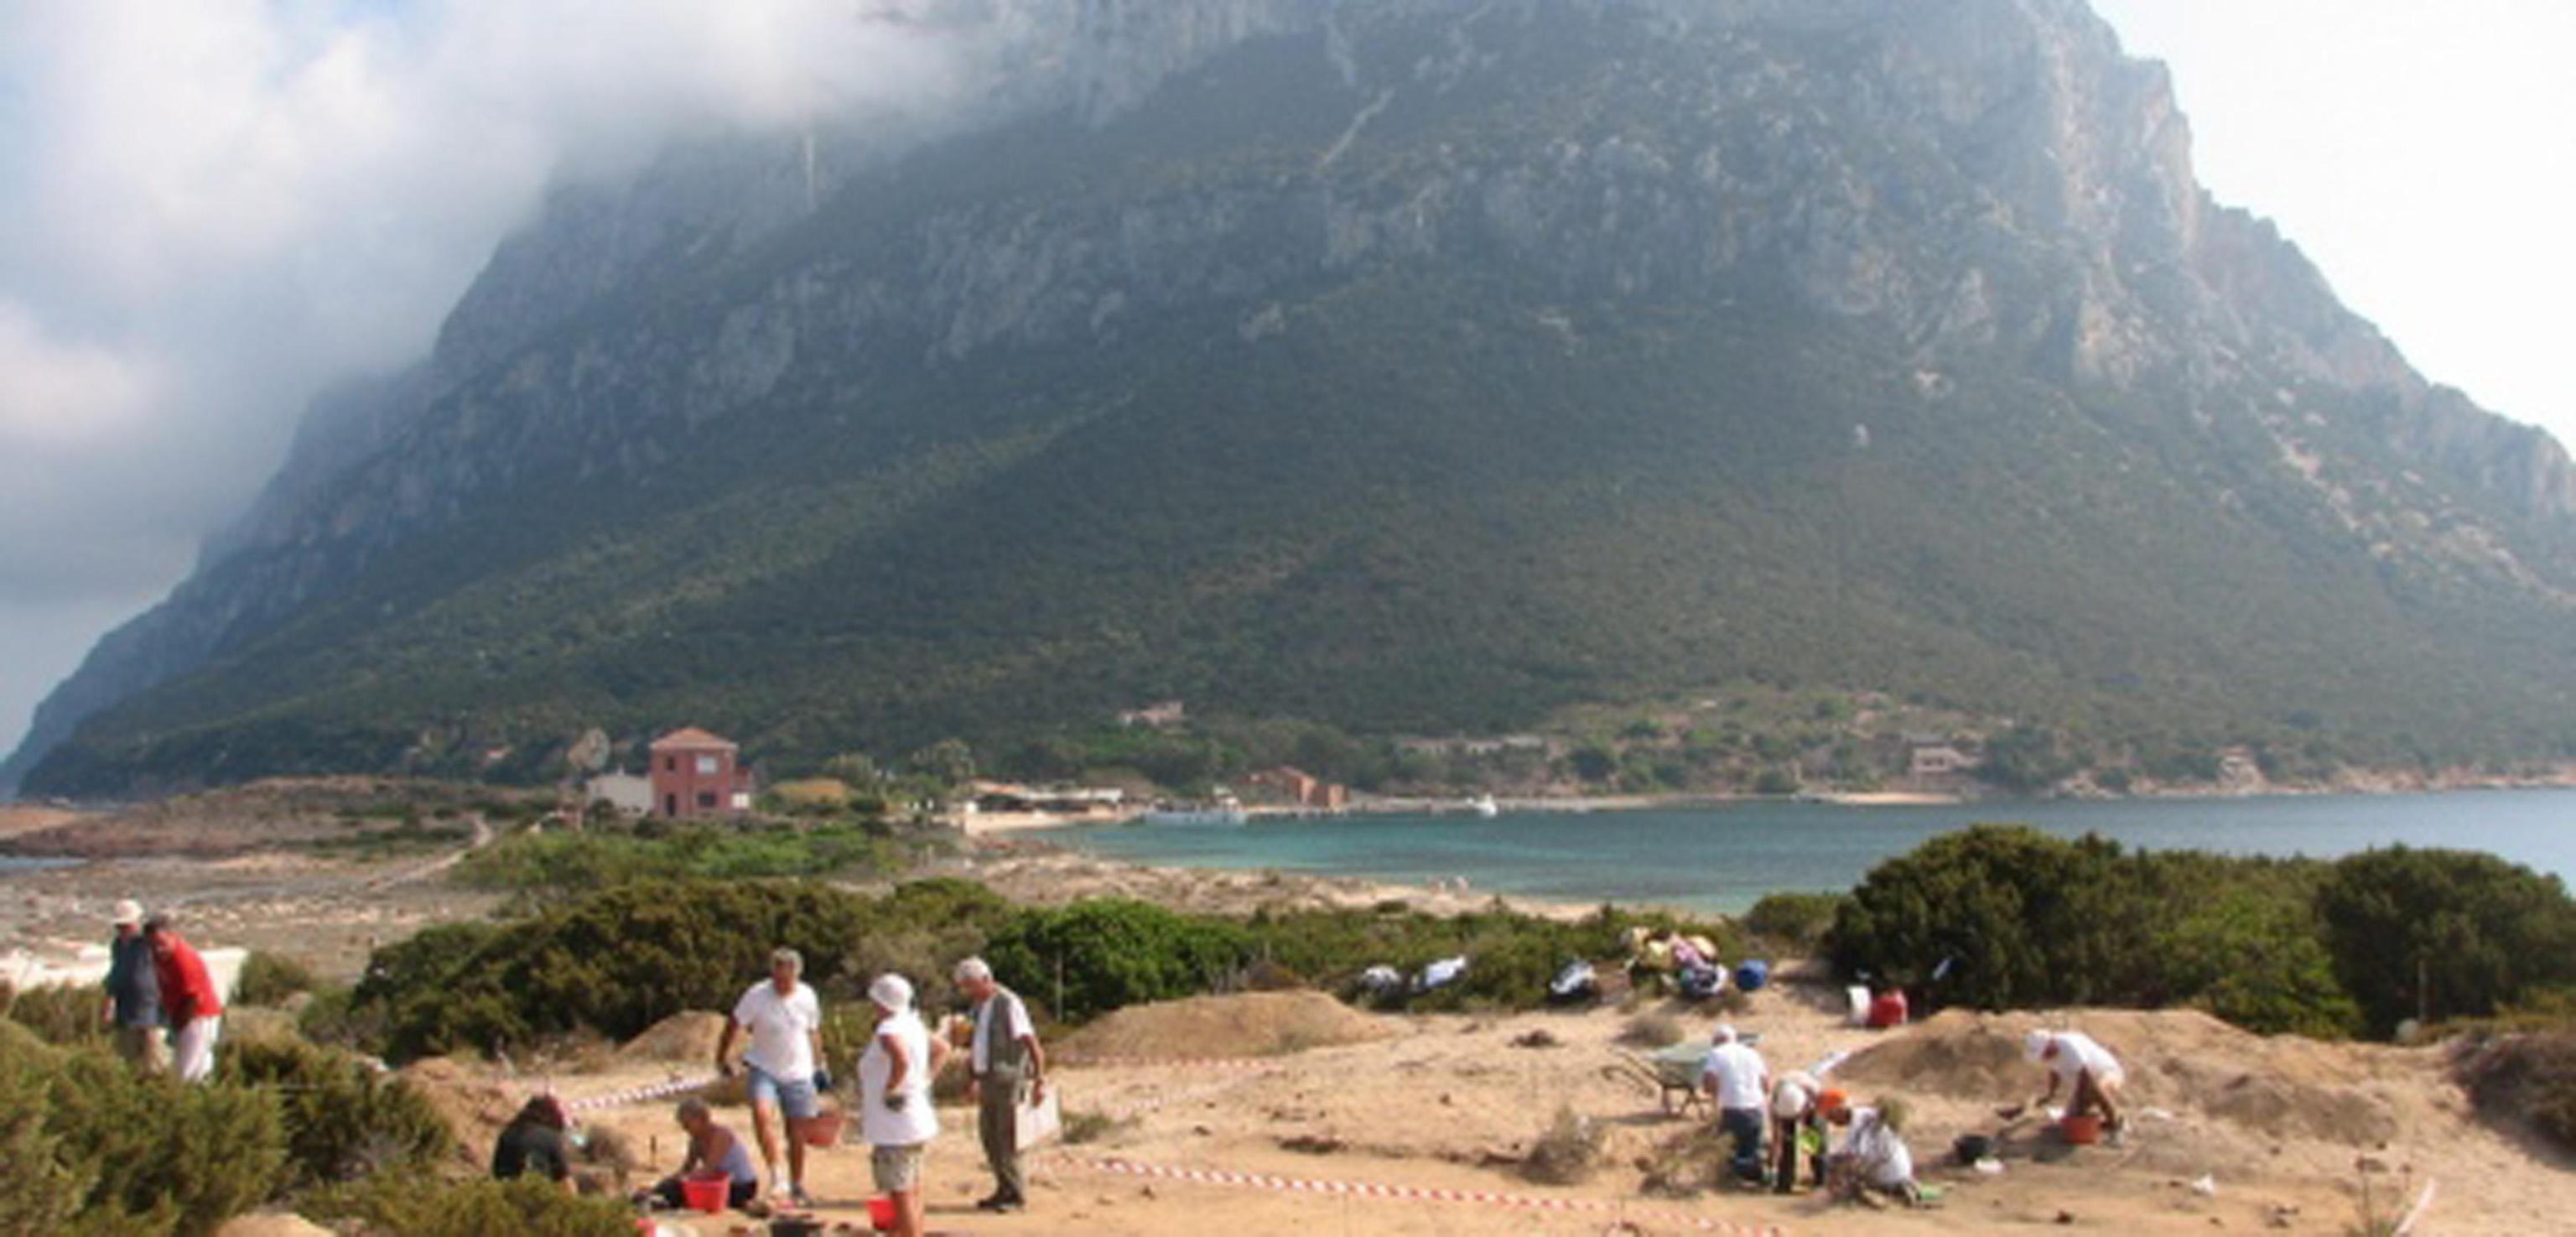 Emerge insediamento etrusco in Sardegna